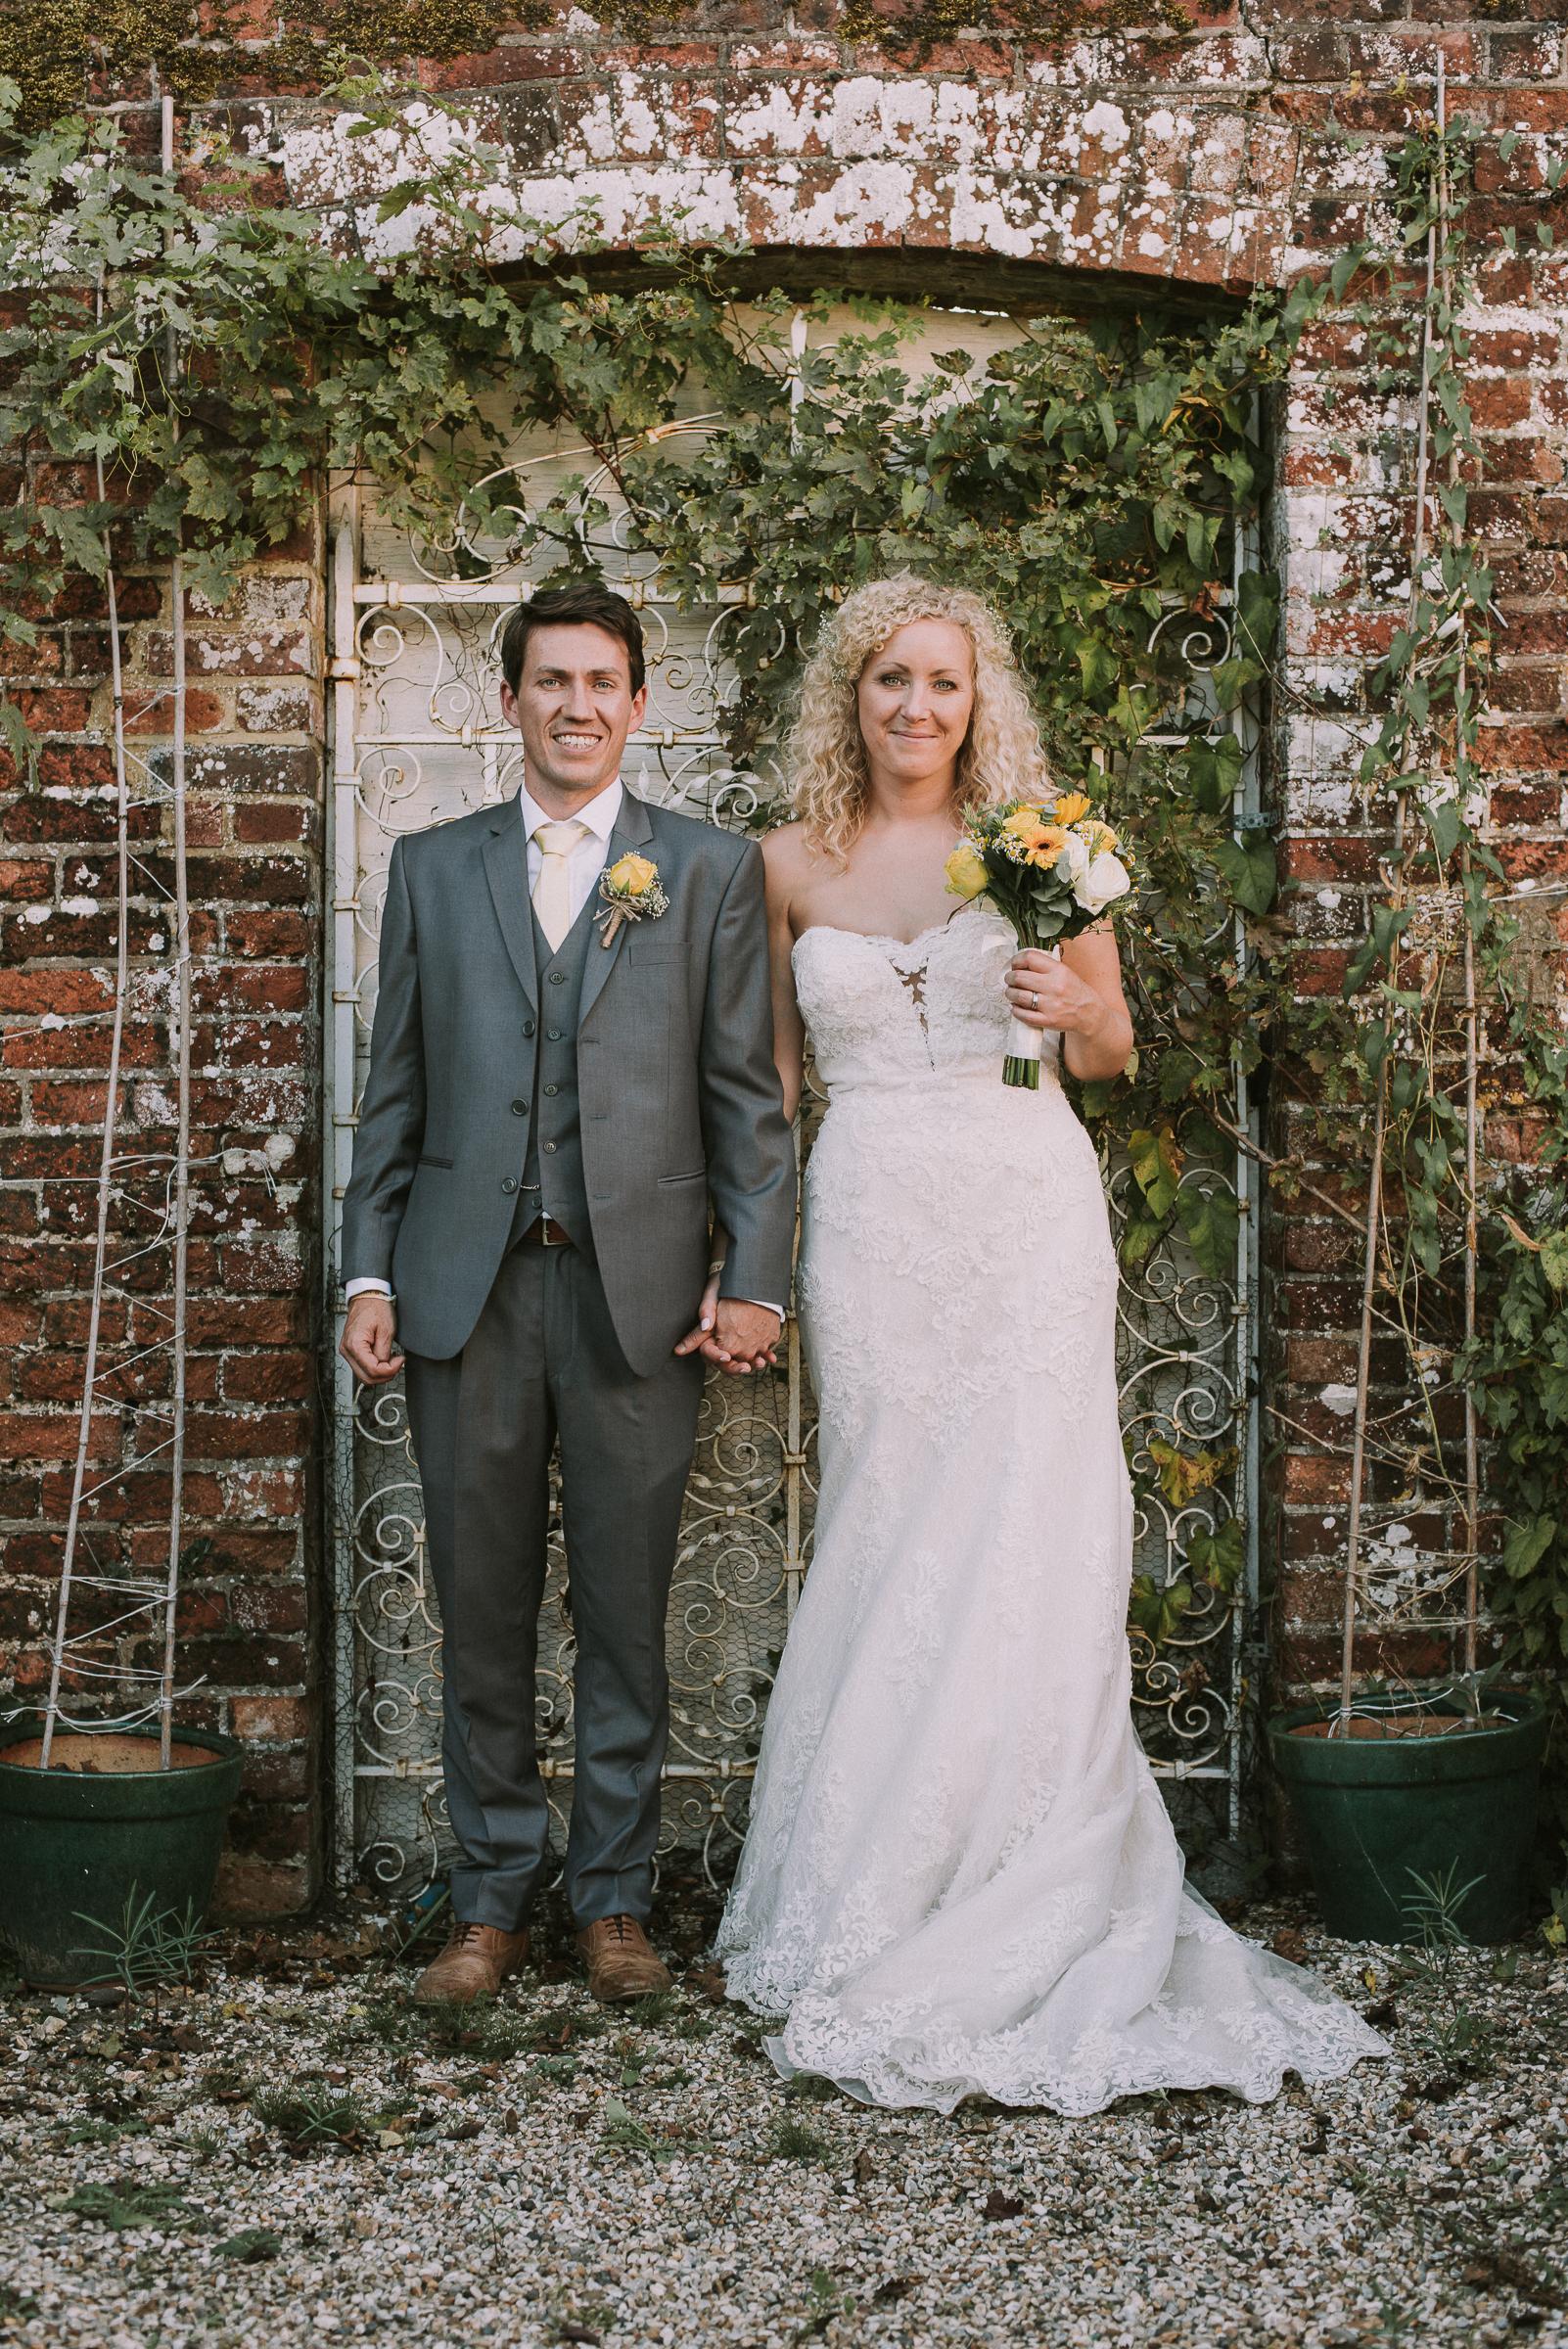 Festival Wedding Photography Secret Garden Maidstone Kent Jay Tunbridge Photorgaphic Co-45.jpg